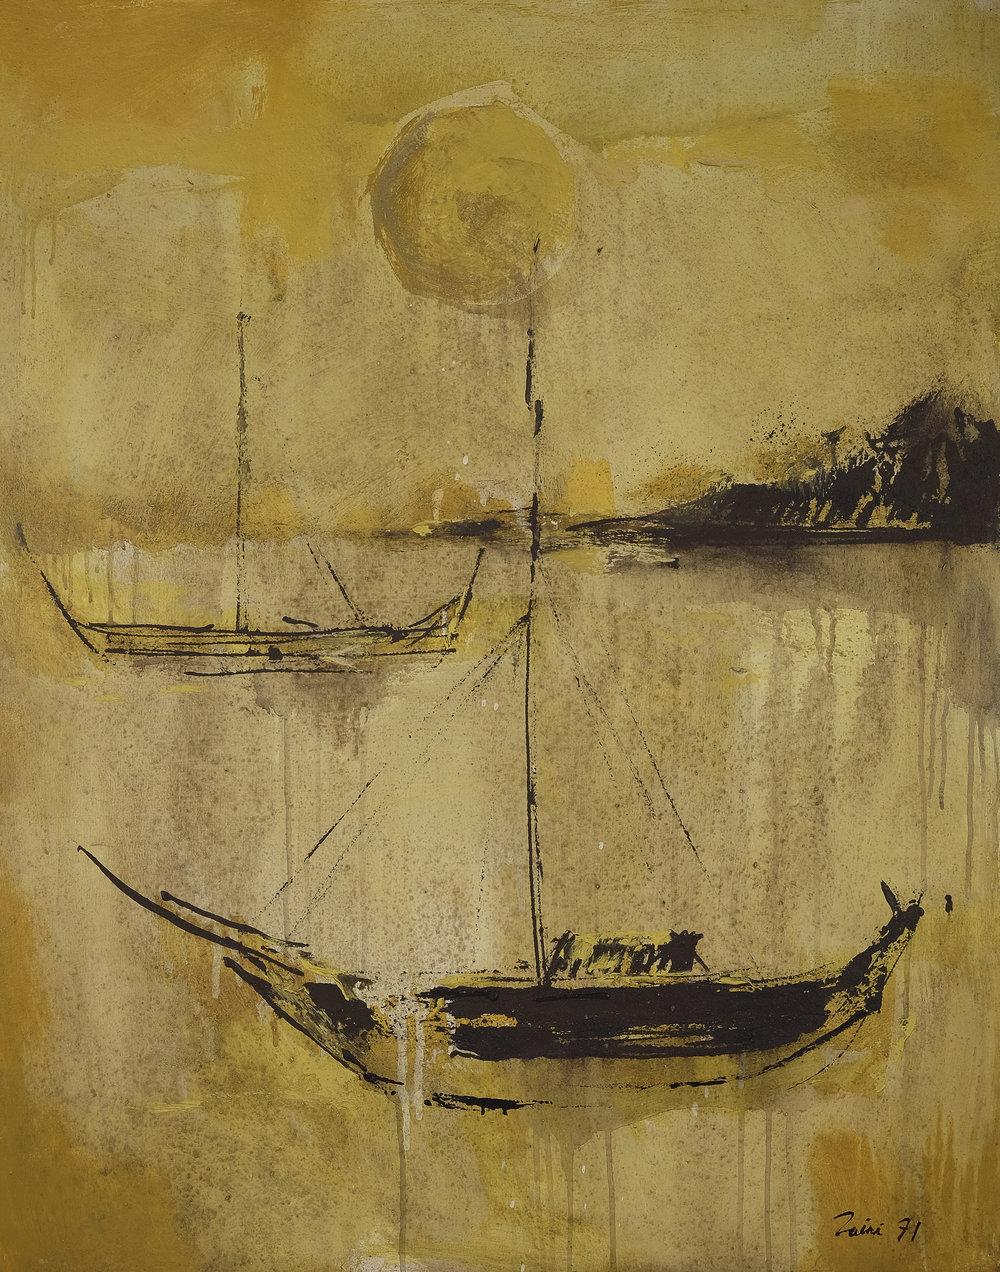 Zaini, Ships, ooc, 100 x 80 cm, 1971.jpg